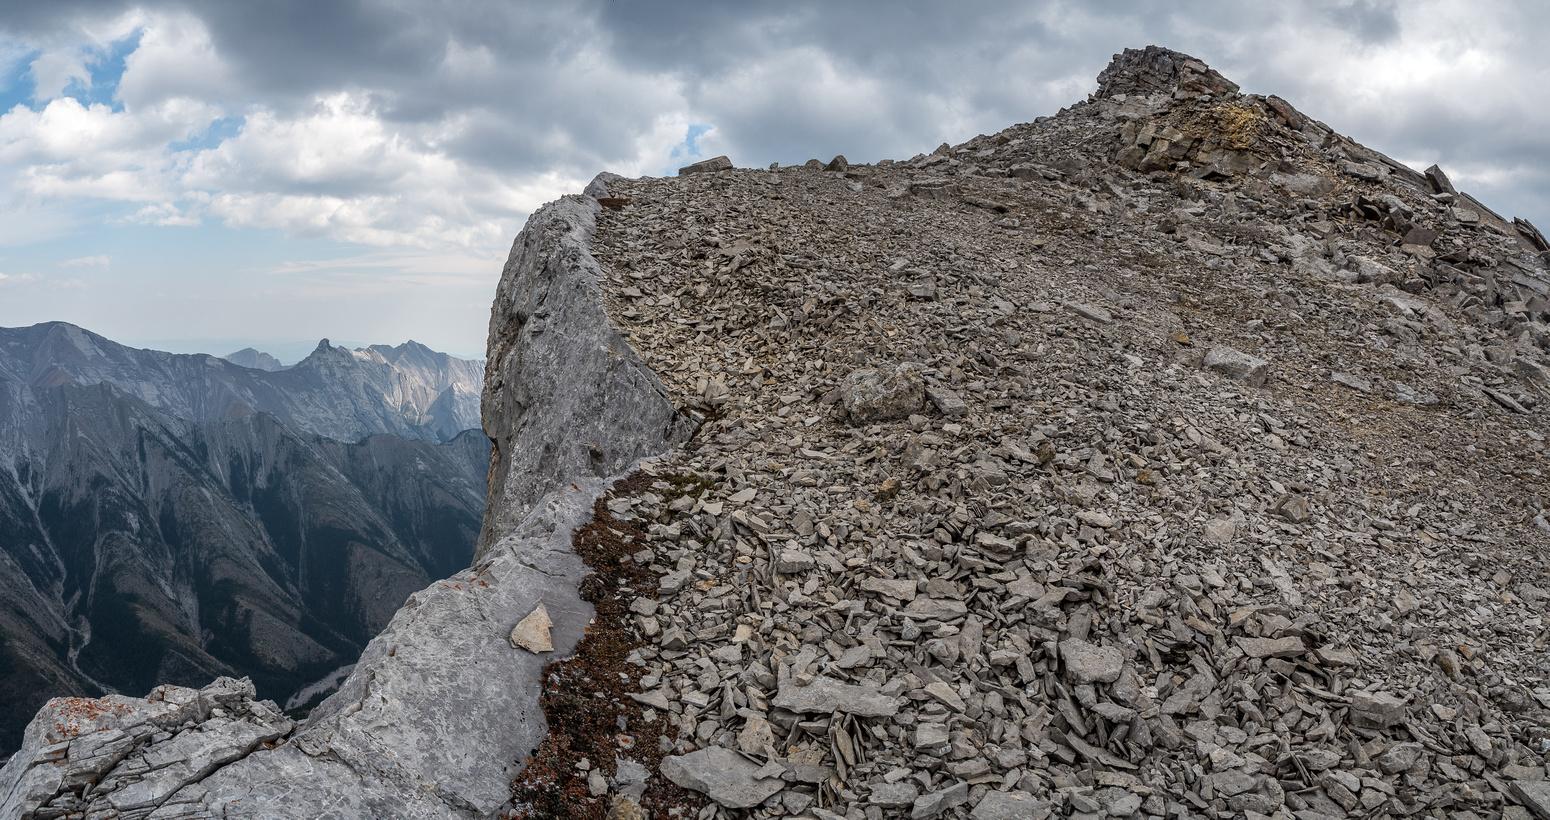 Interesting terrain near the summit.